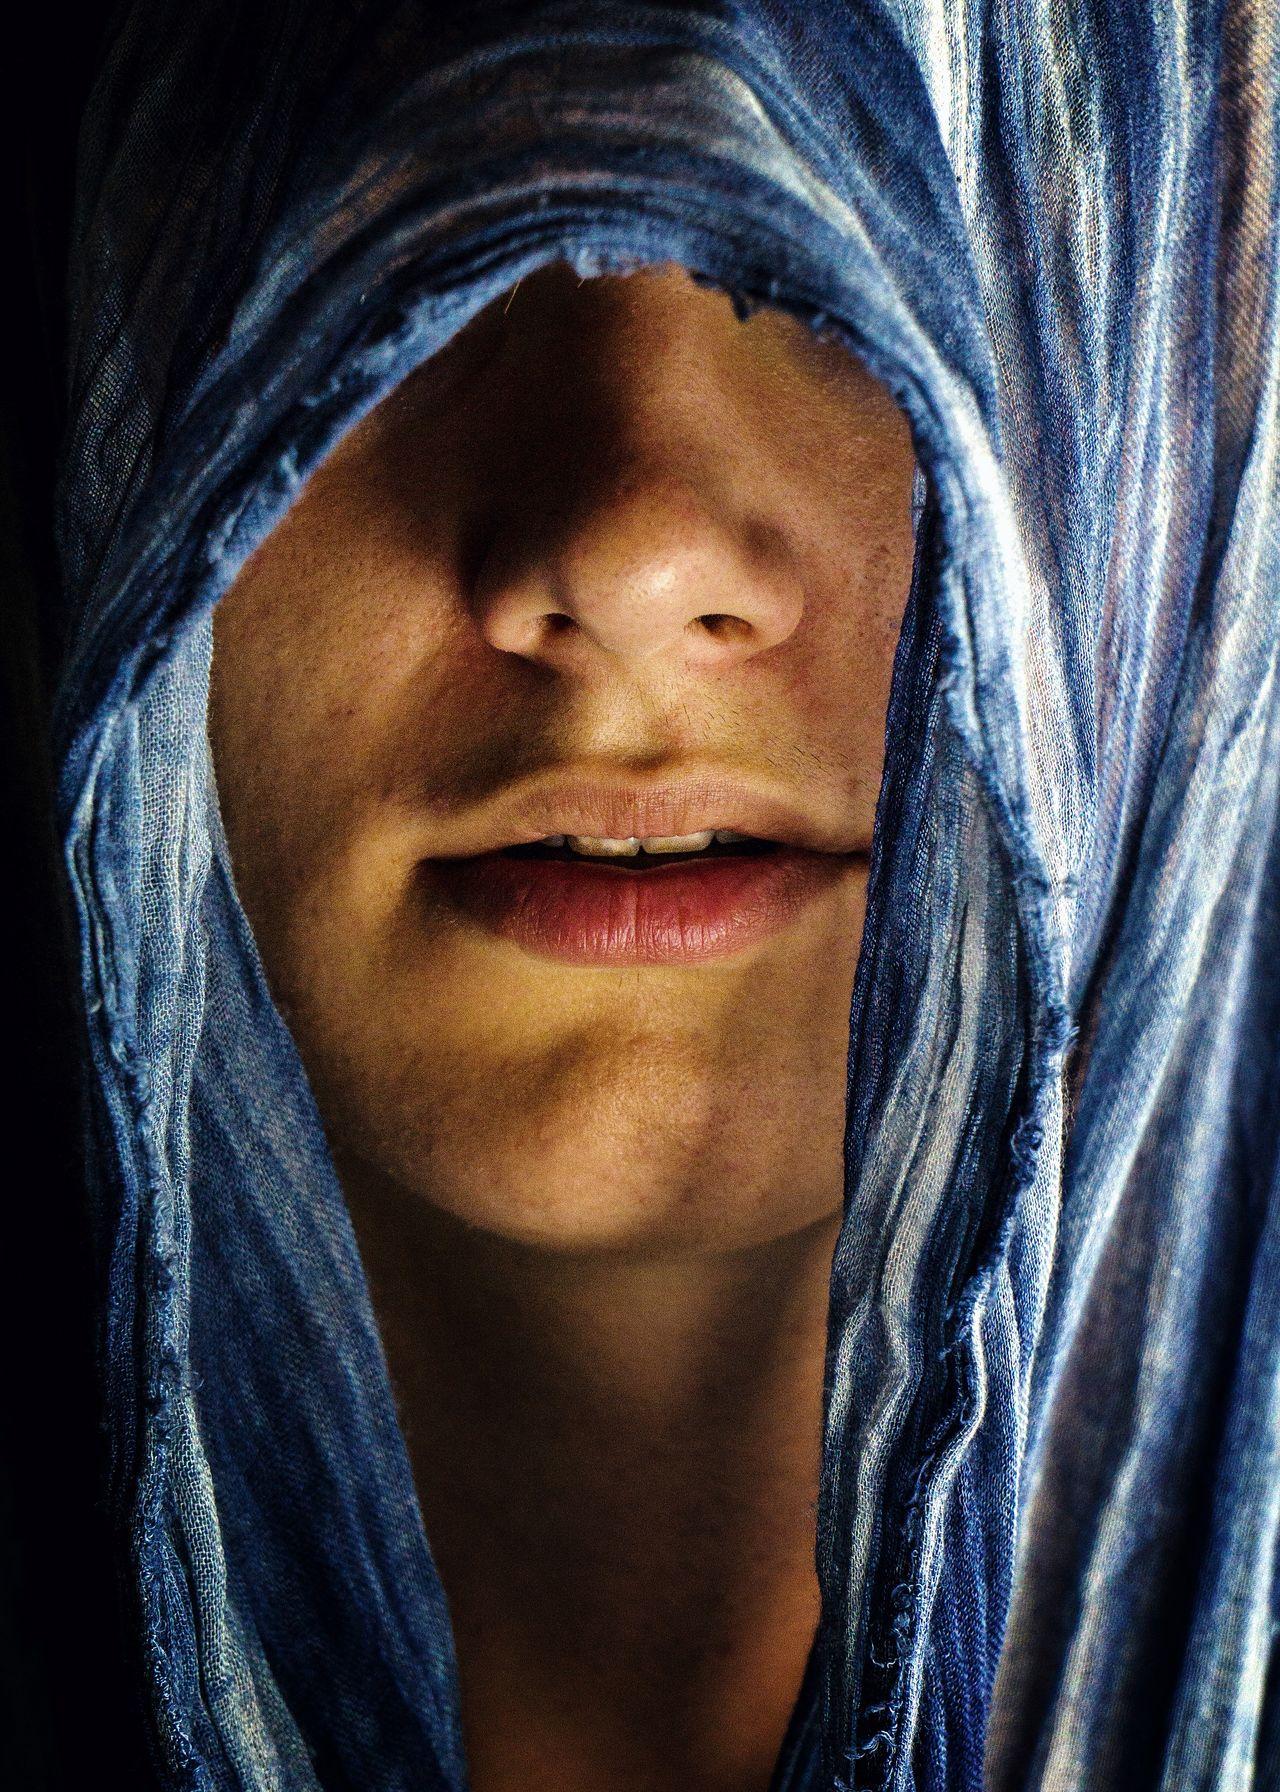 Beauté voilée. Front View One Person Midsection Close-up Human Body Part Human Face Real People Portrait People Voilette Voile Tissu Blue